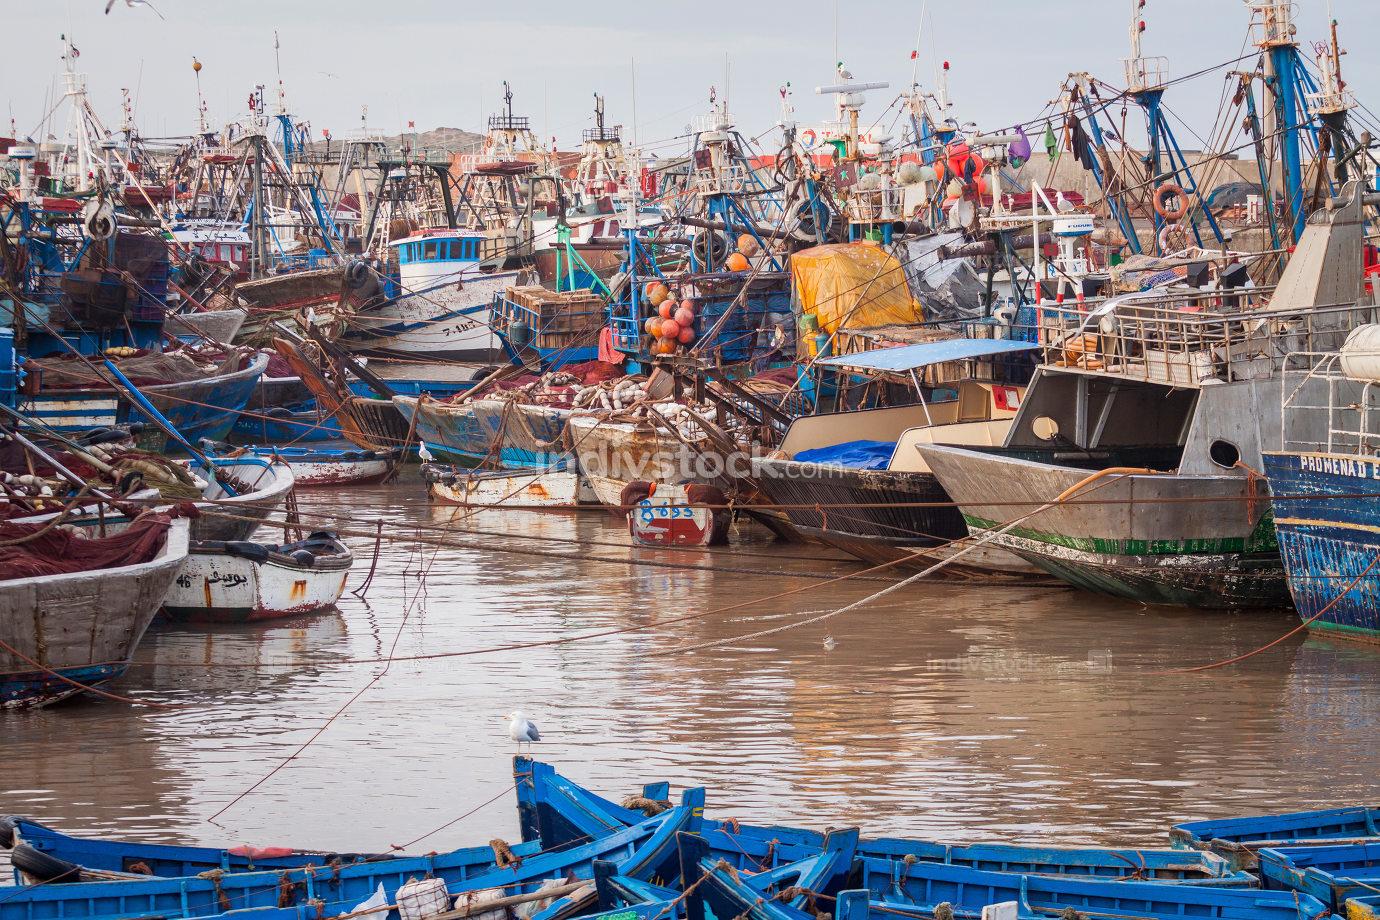 Fiishing boats in Essaouira, Morocco, Africa